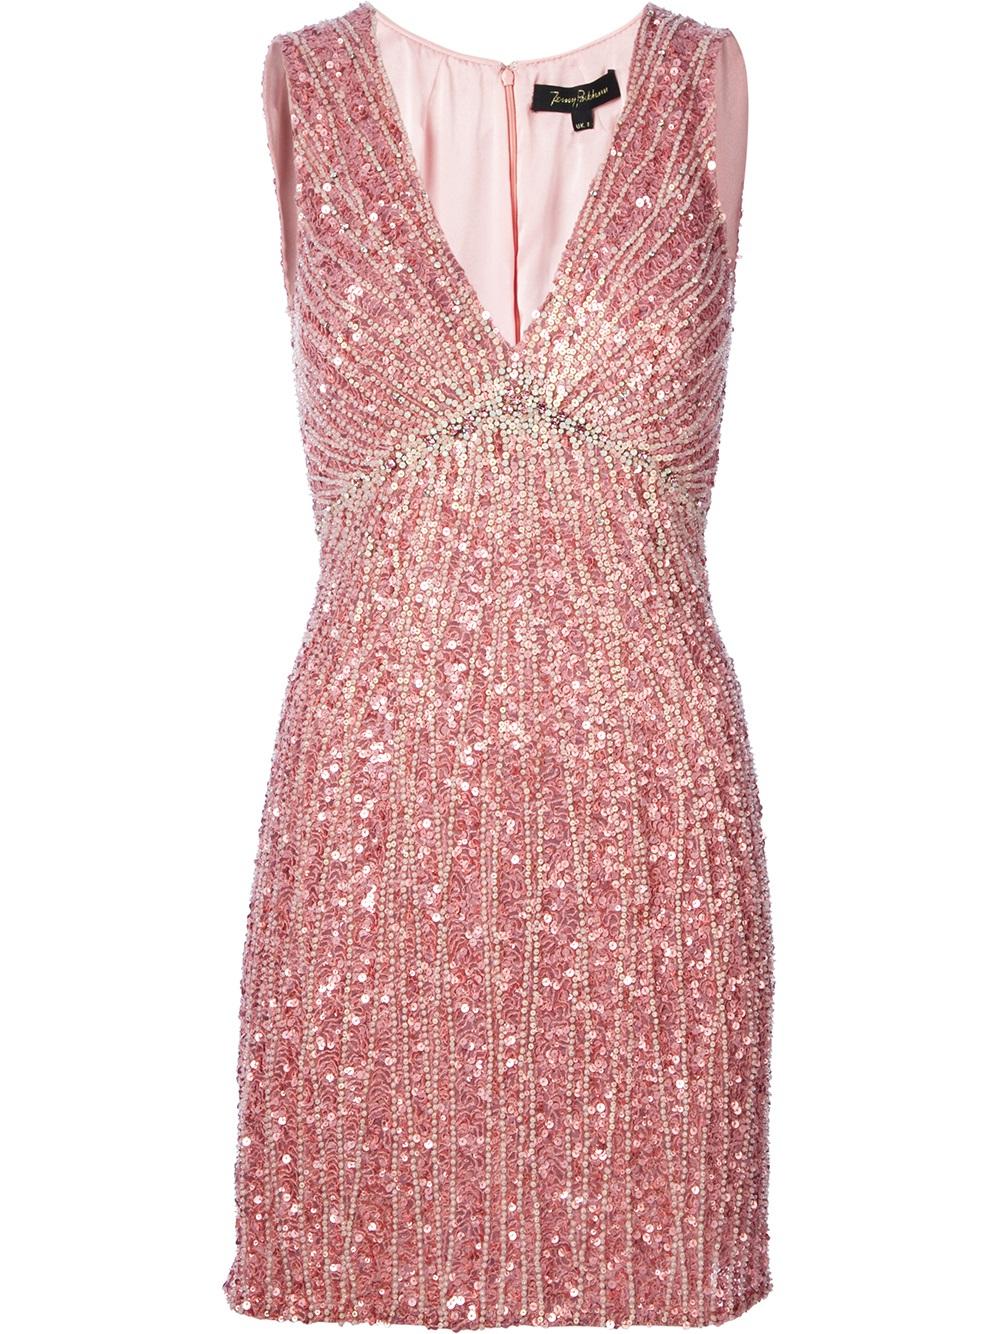 e0f5f3747cd2 Jenny Packham Sequin Embellished Dress in Pink - Lyst